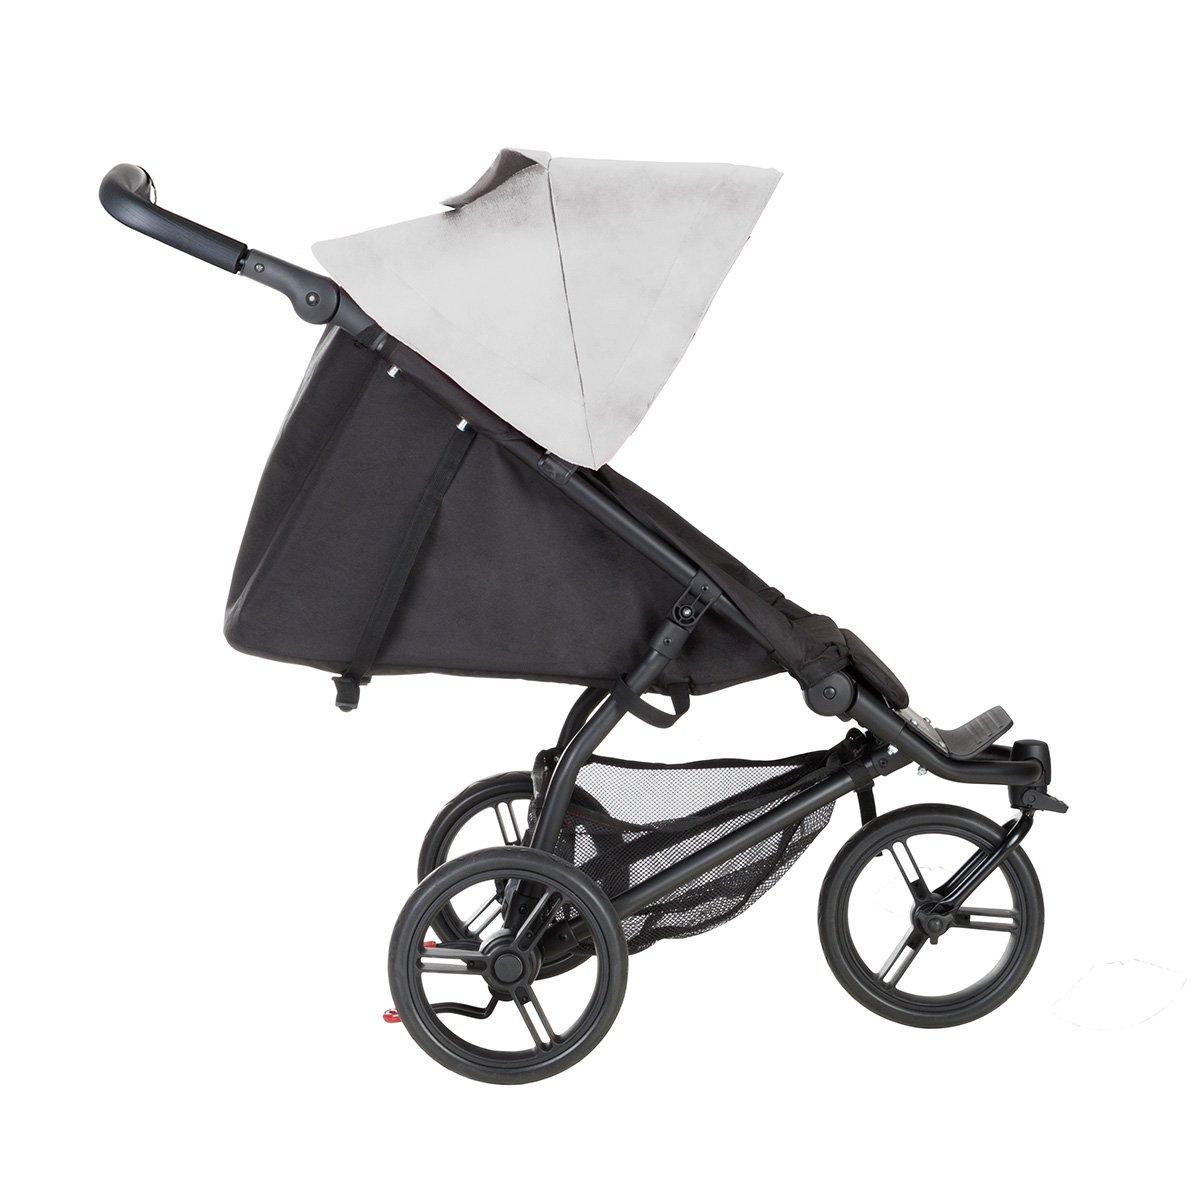 Cyber Mountain Buggy Mini V3.1 Stroller